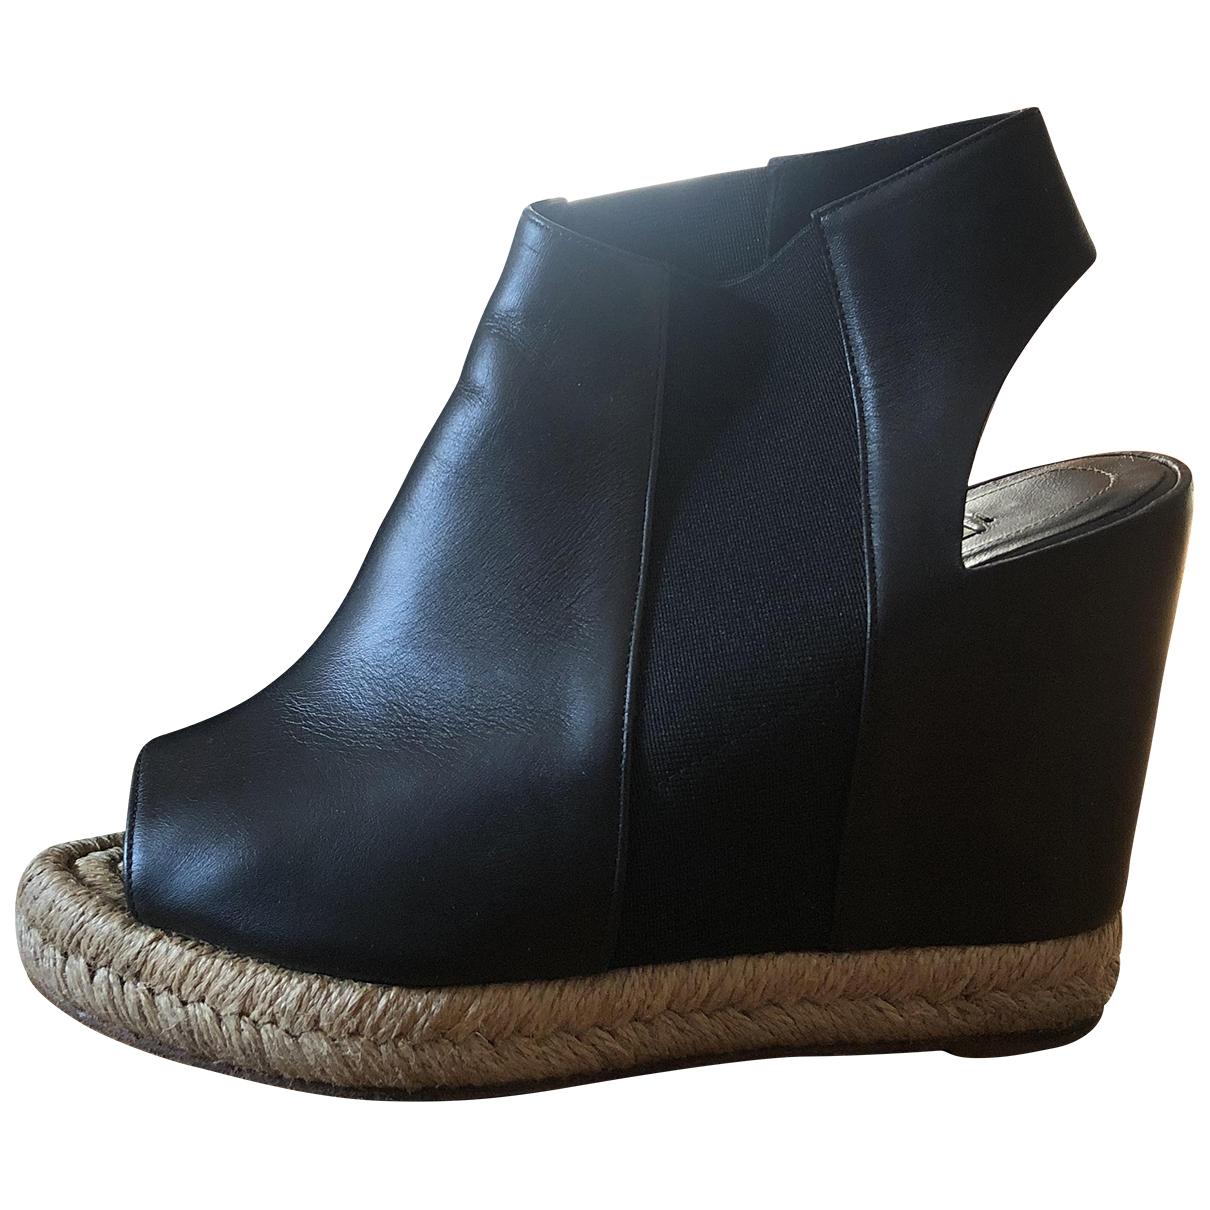 Balenciaga - Espadrilles   pour femme en cuir - noir